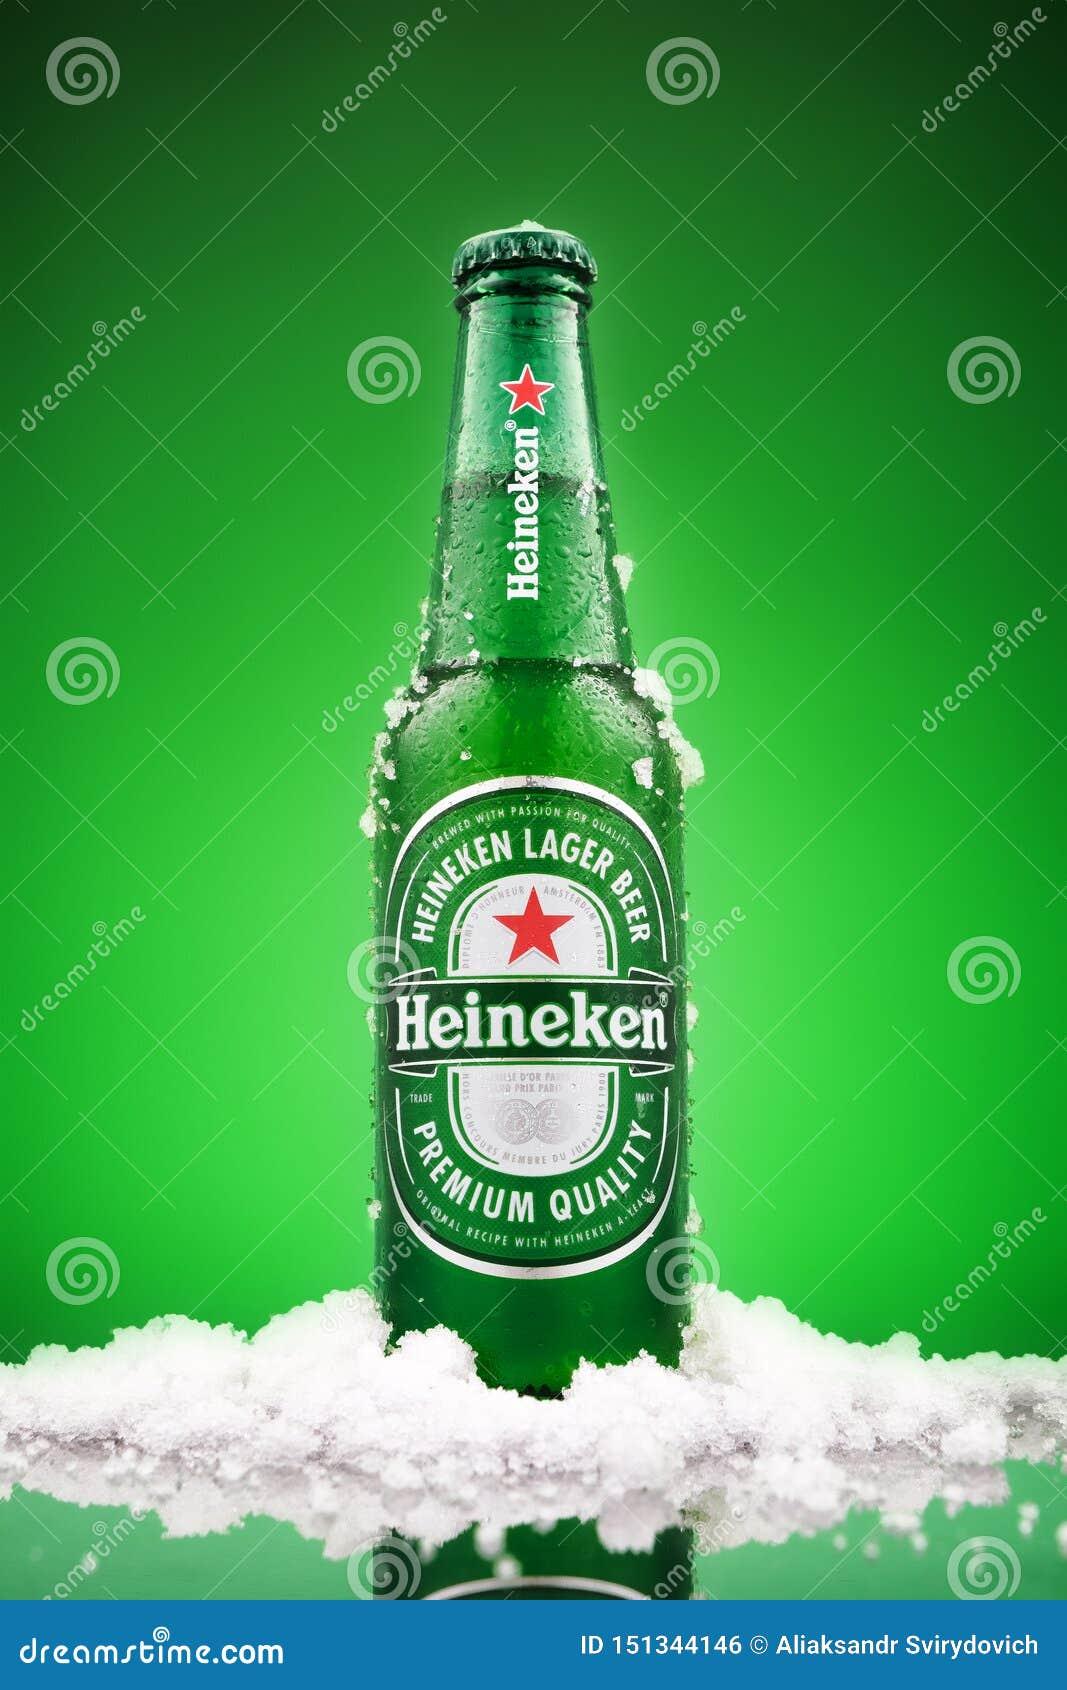 MINSK, BELARUS - MARCH 13, 2019: Cold bottle of Heineken Lager Beer over green background. Heineken is the flagship